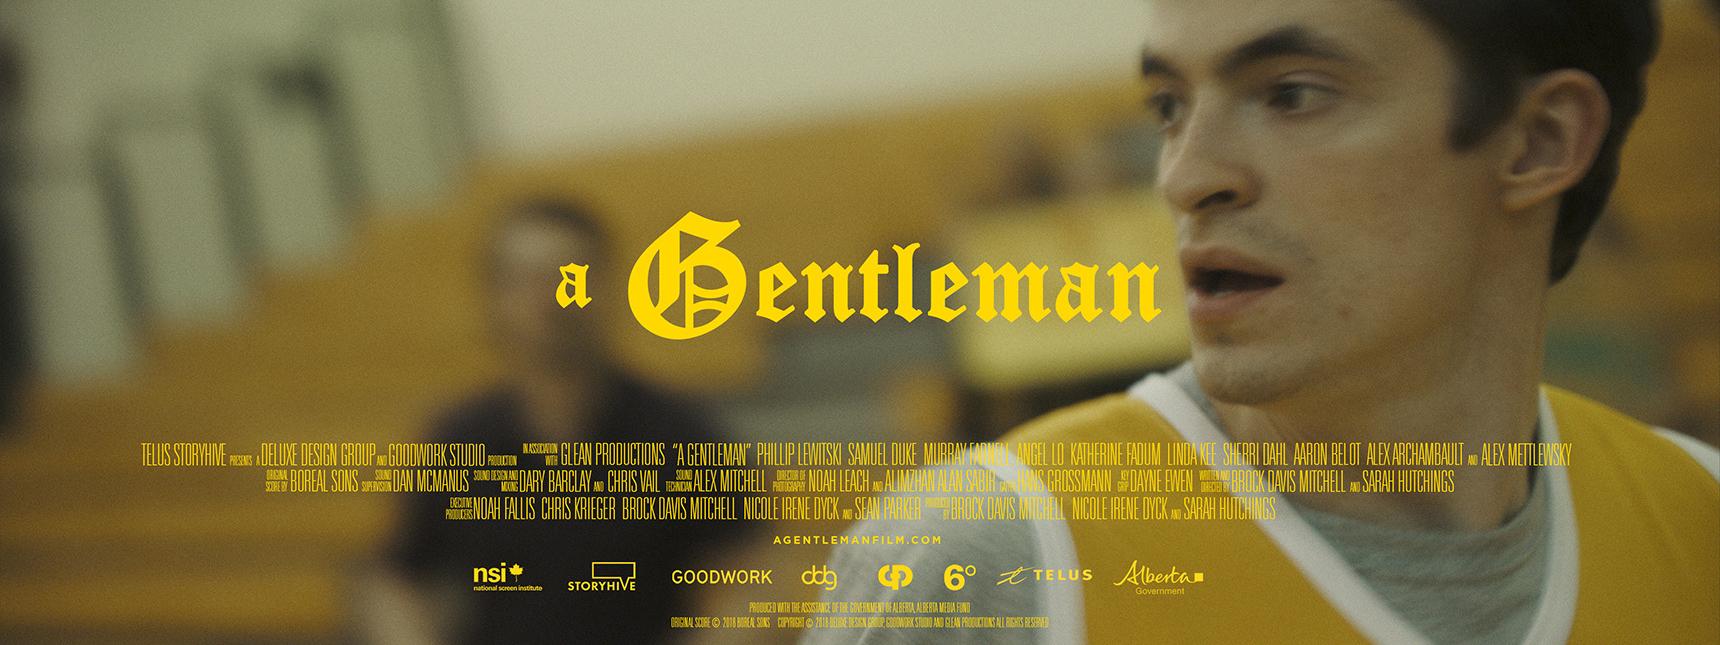 a gentleman_IMG_0722.jpg